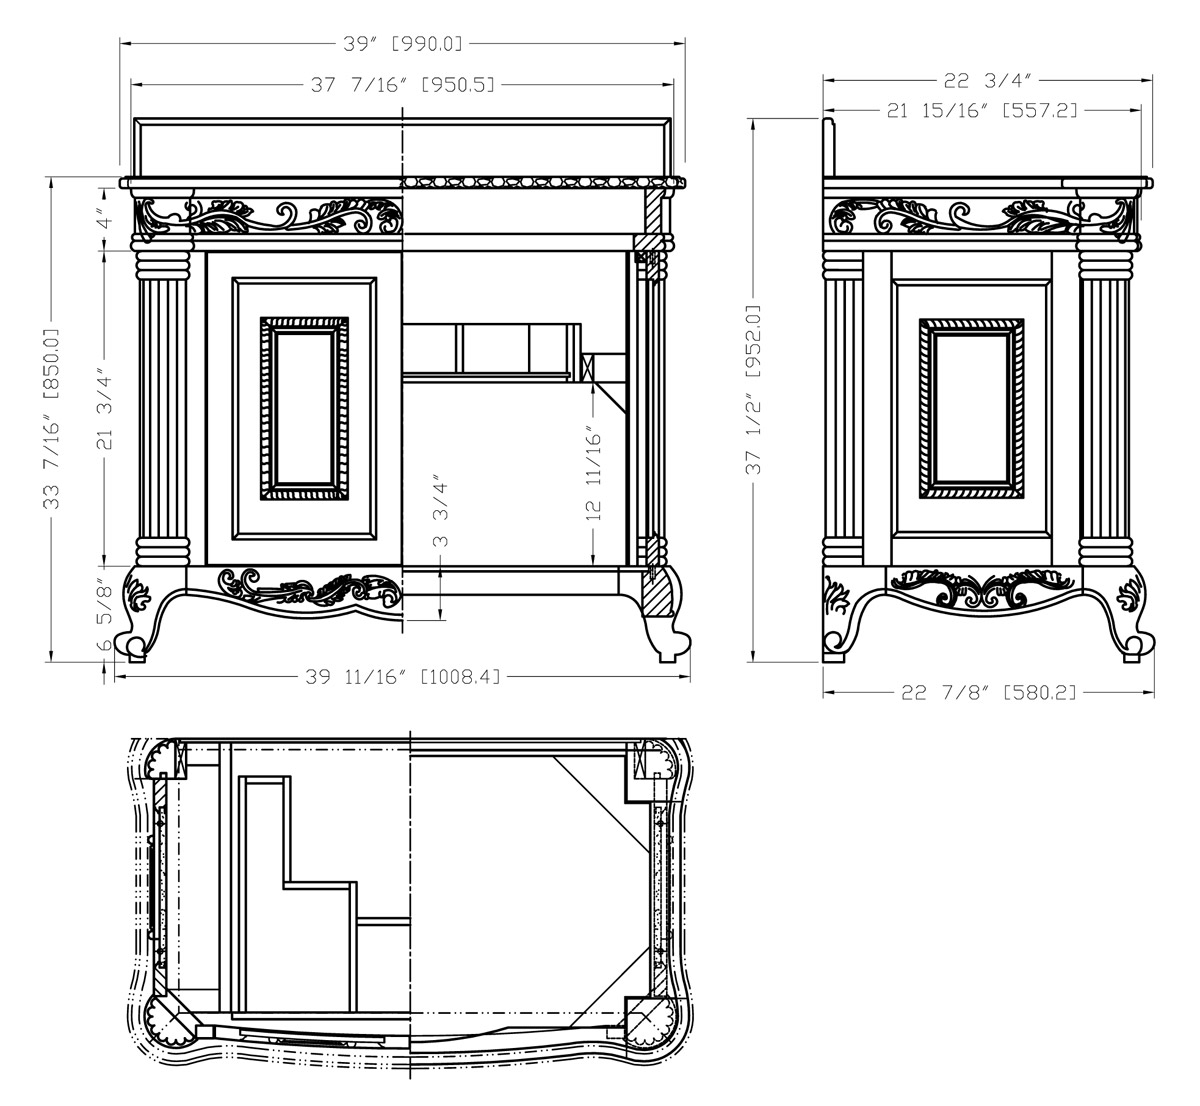 42 Bathroom Vanity Cabinet. Image Result For 42 Bathroom Vanity Cabinet